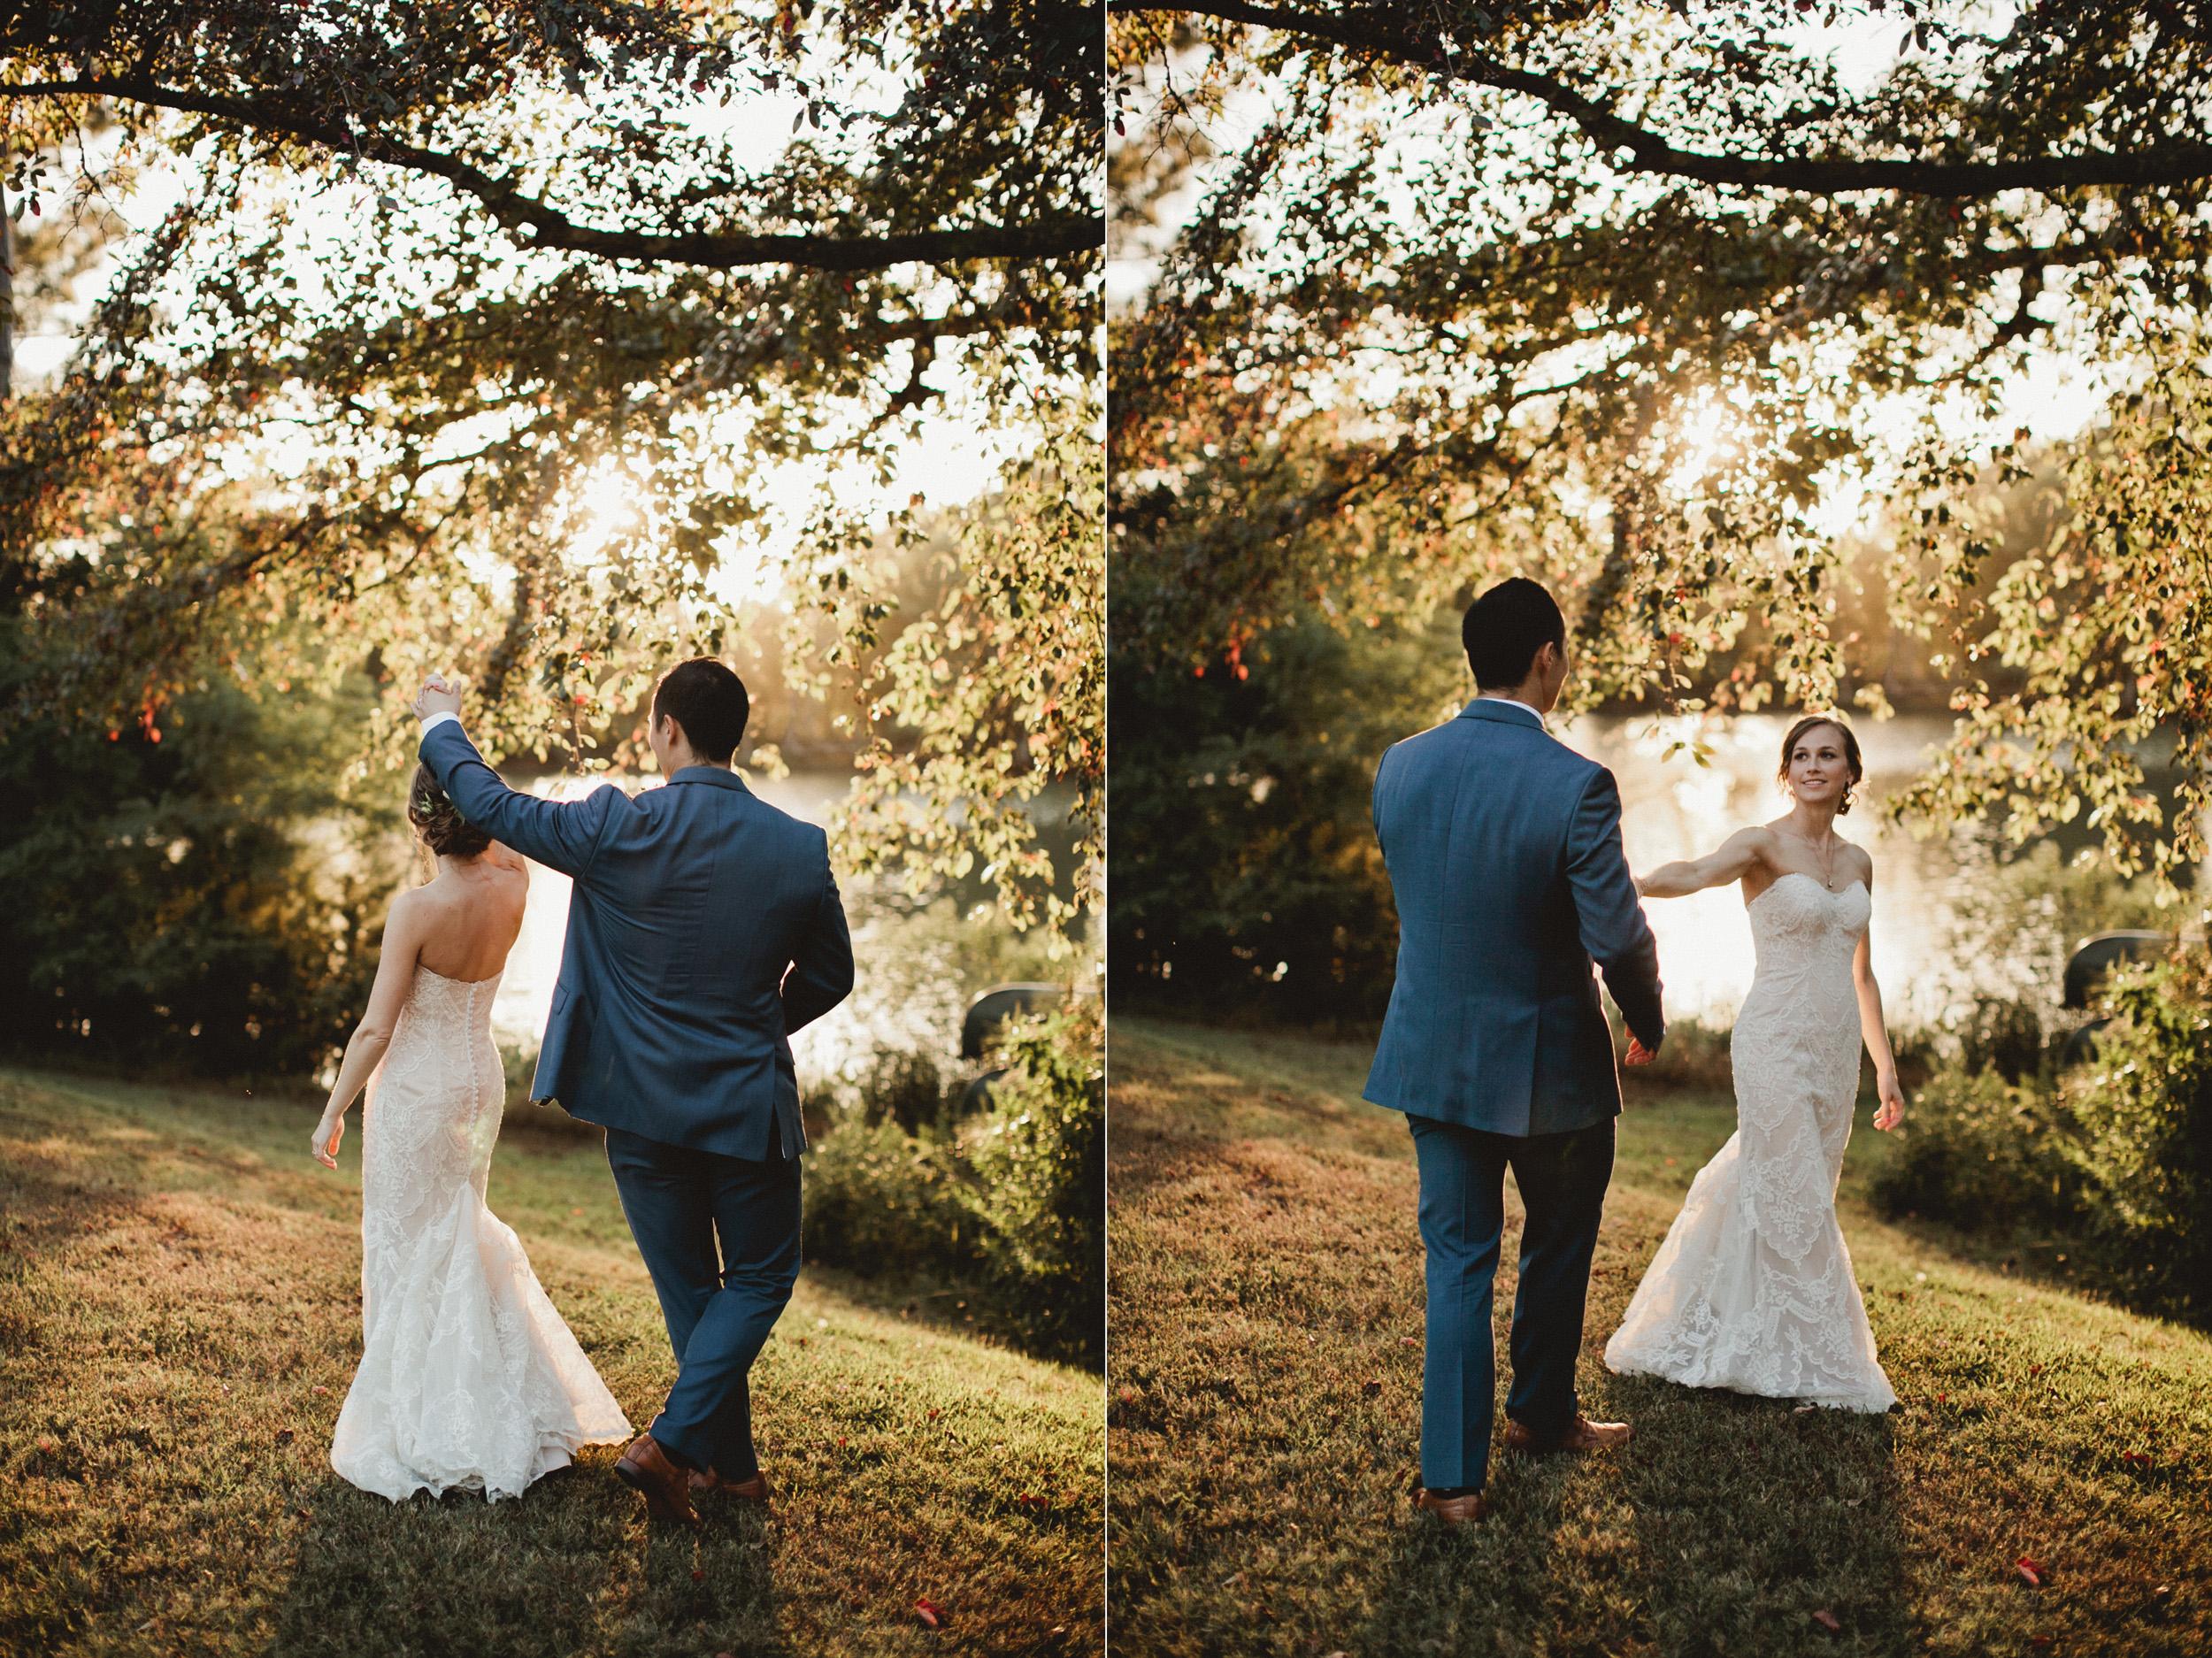 Maine-Wedding-Photographer-917m.jpg